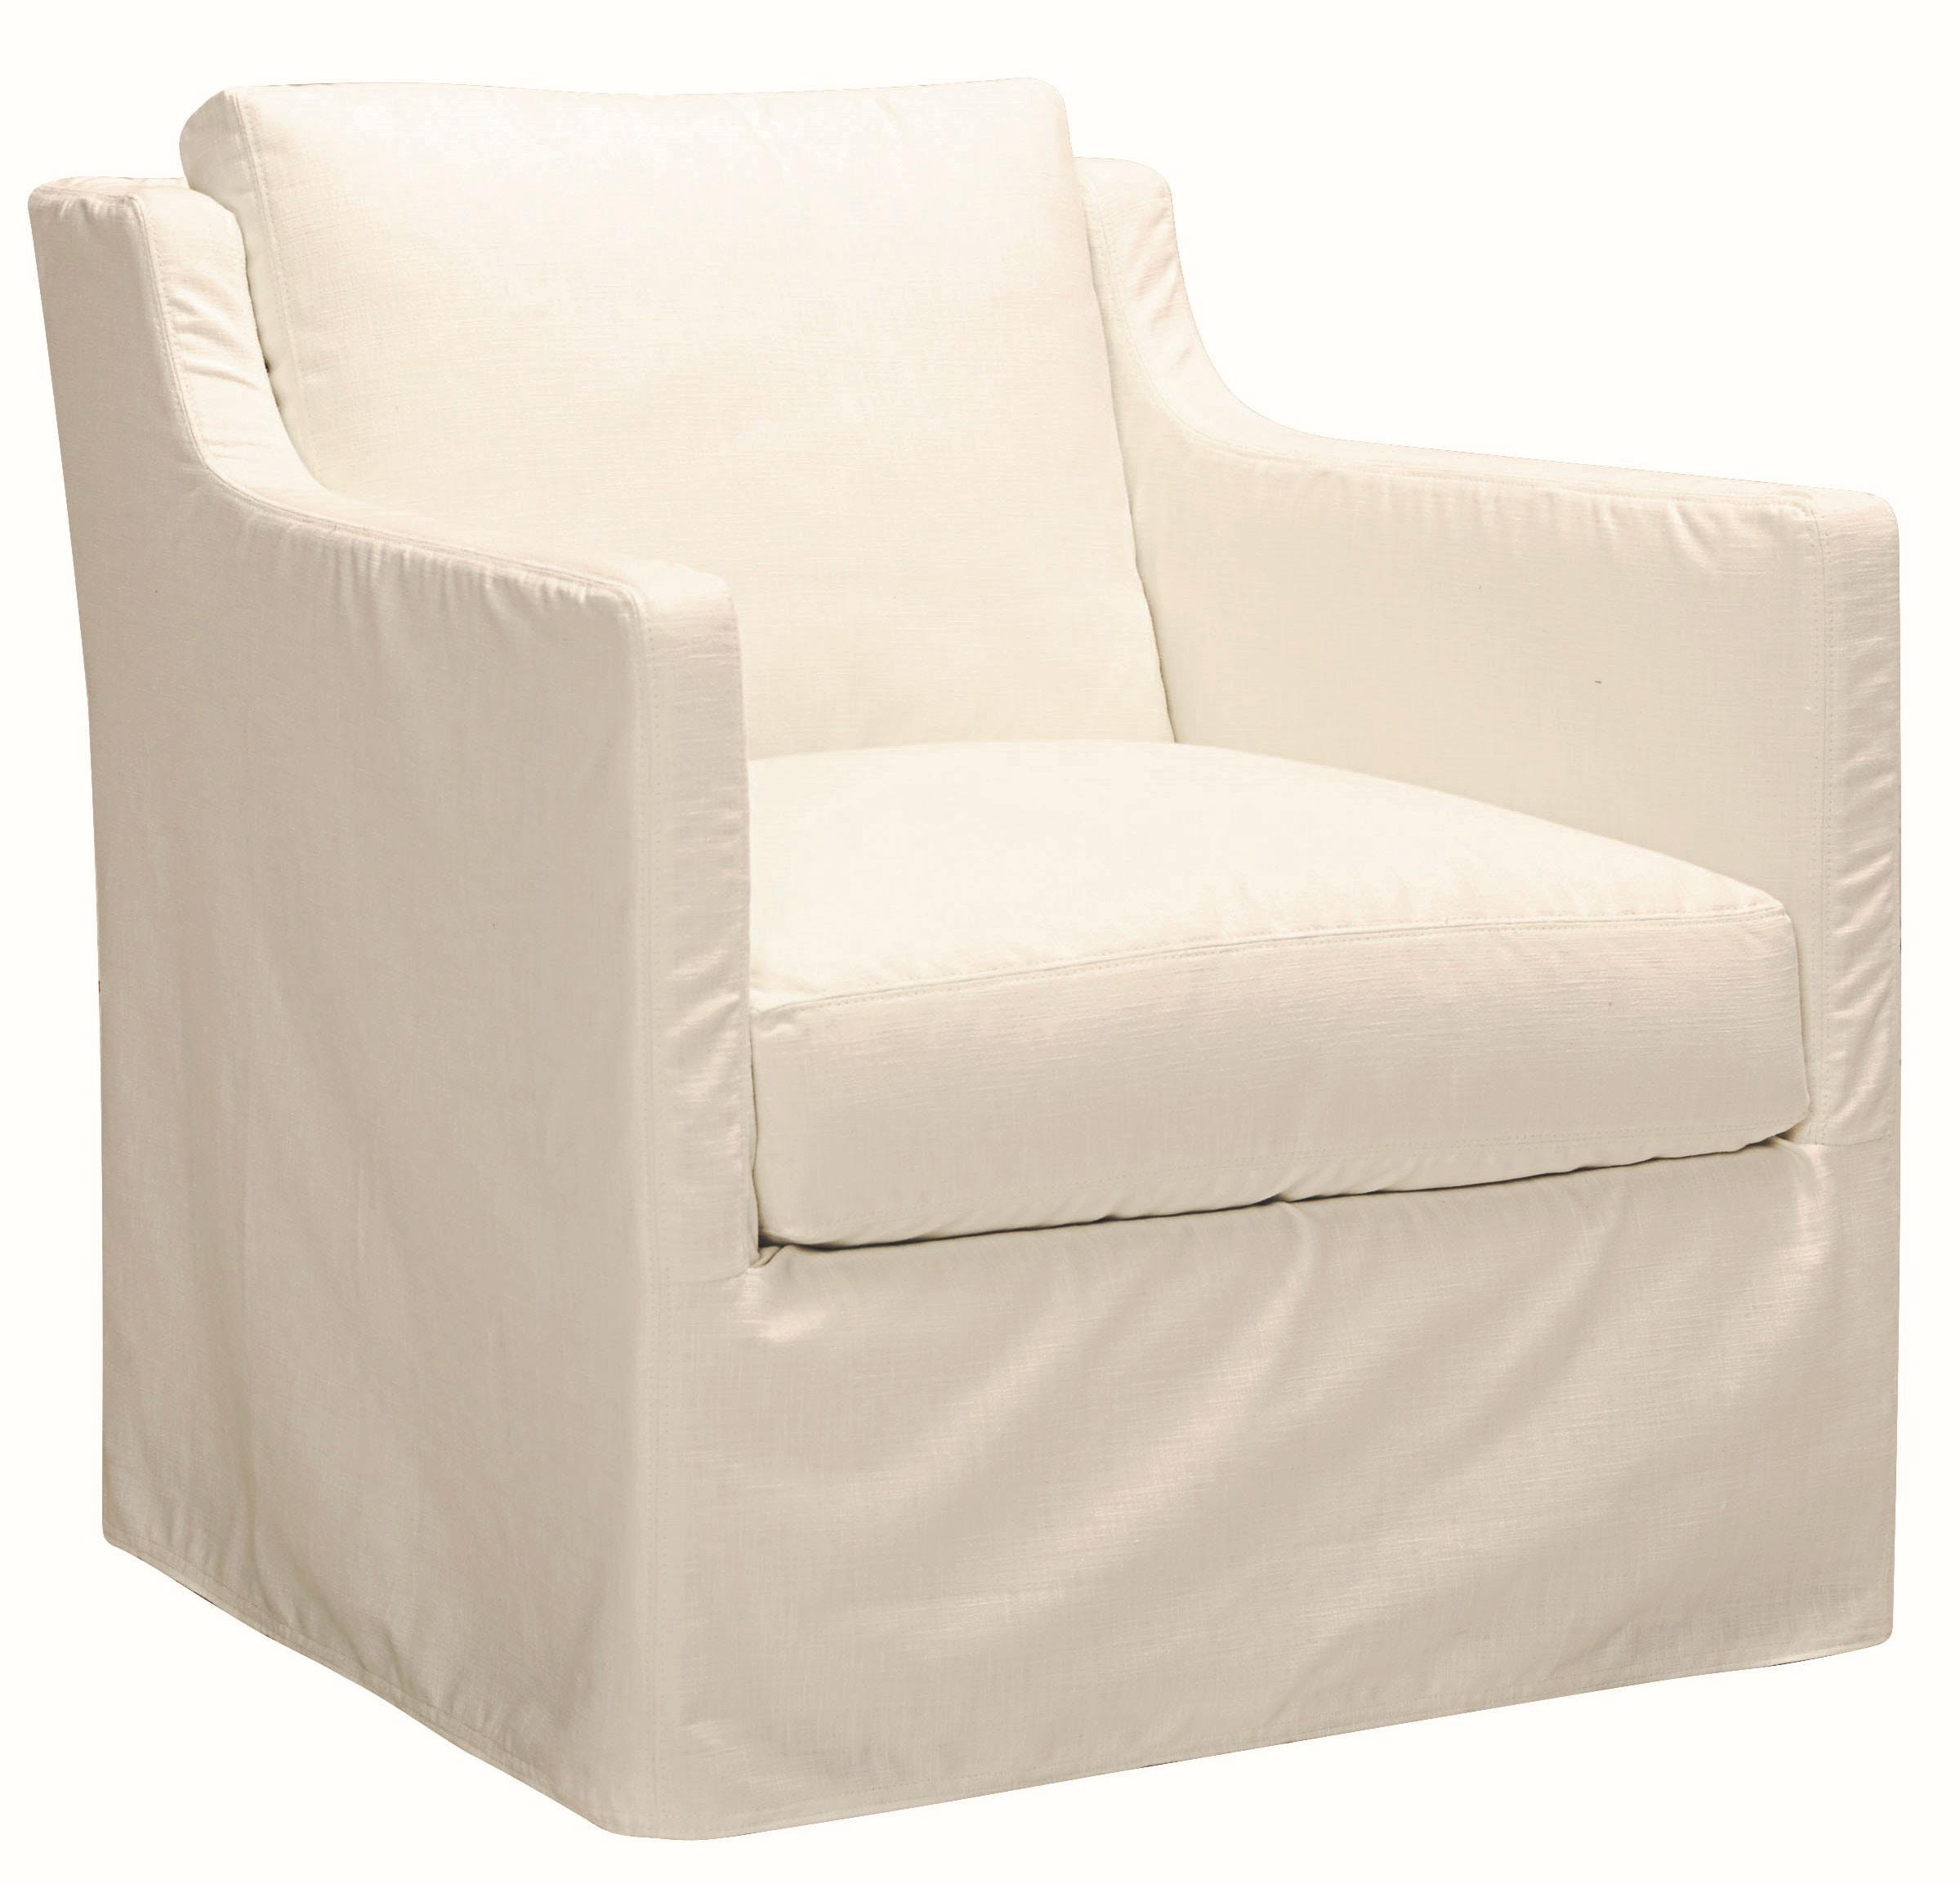 Lee Industries Slipcovered Swivel Chair C1401 01SW